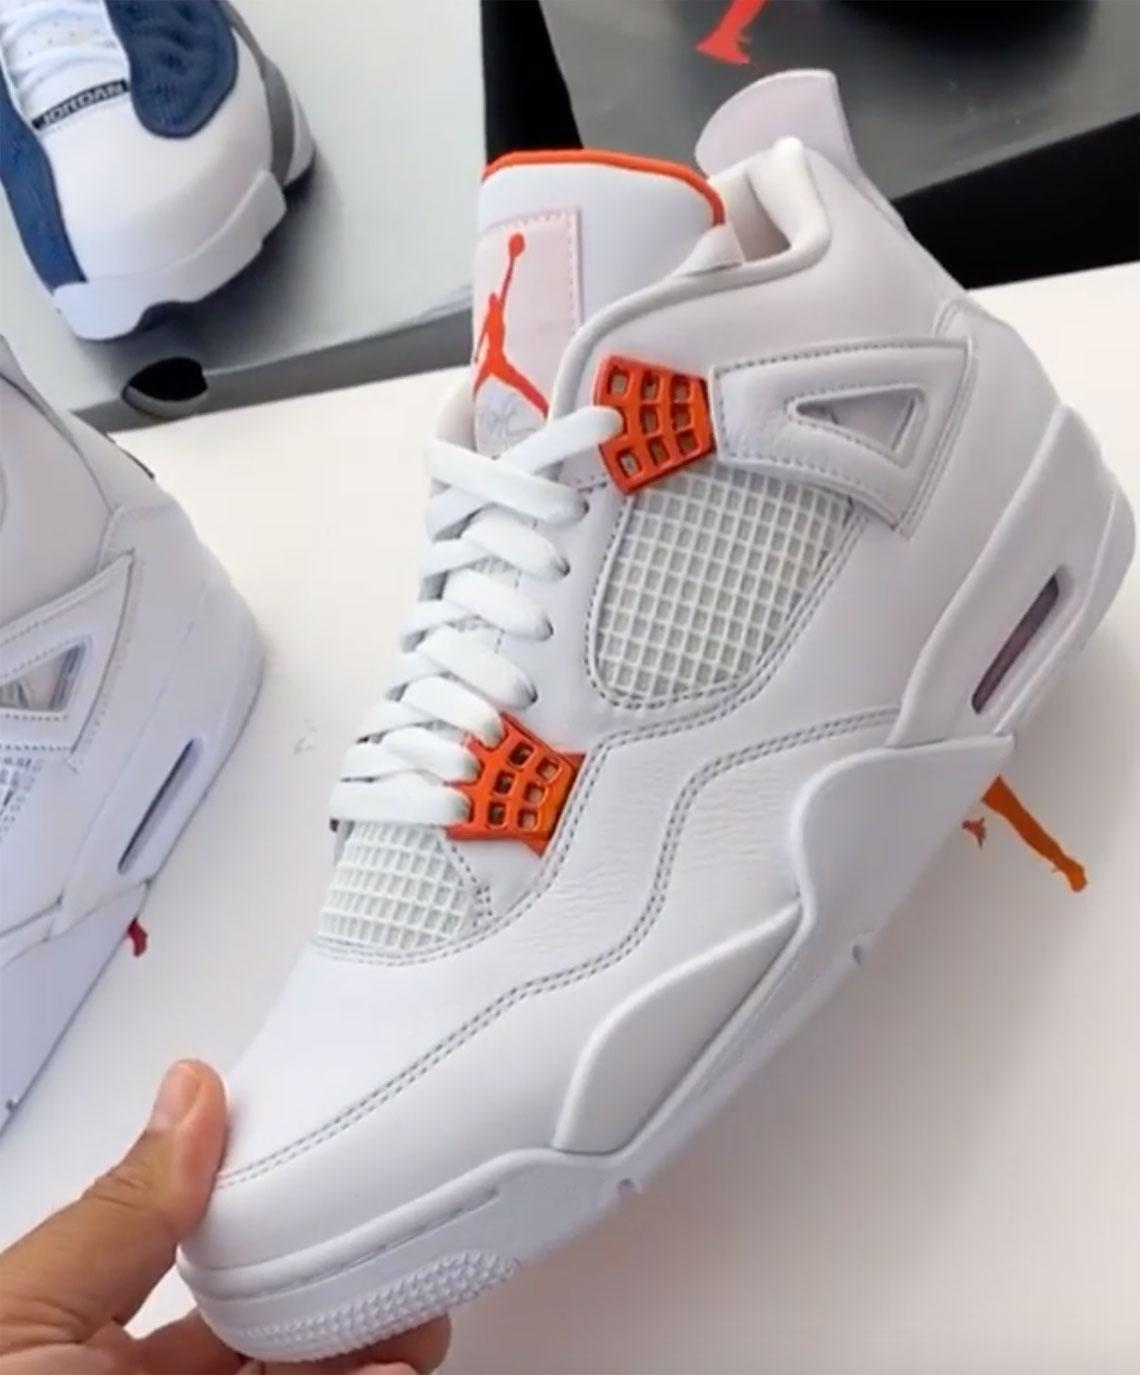 Air Jordan 4 Retro Metallic Pack dévoilé par DJ Khaled